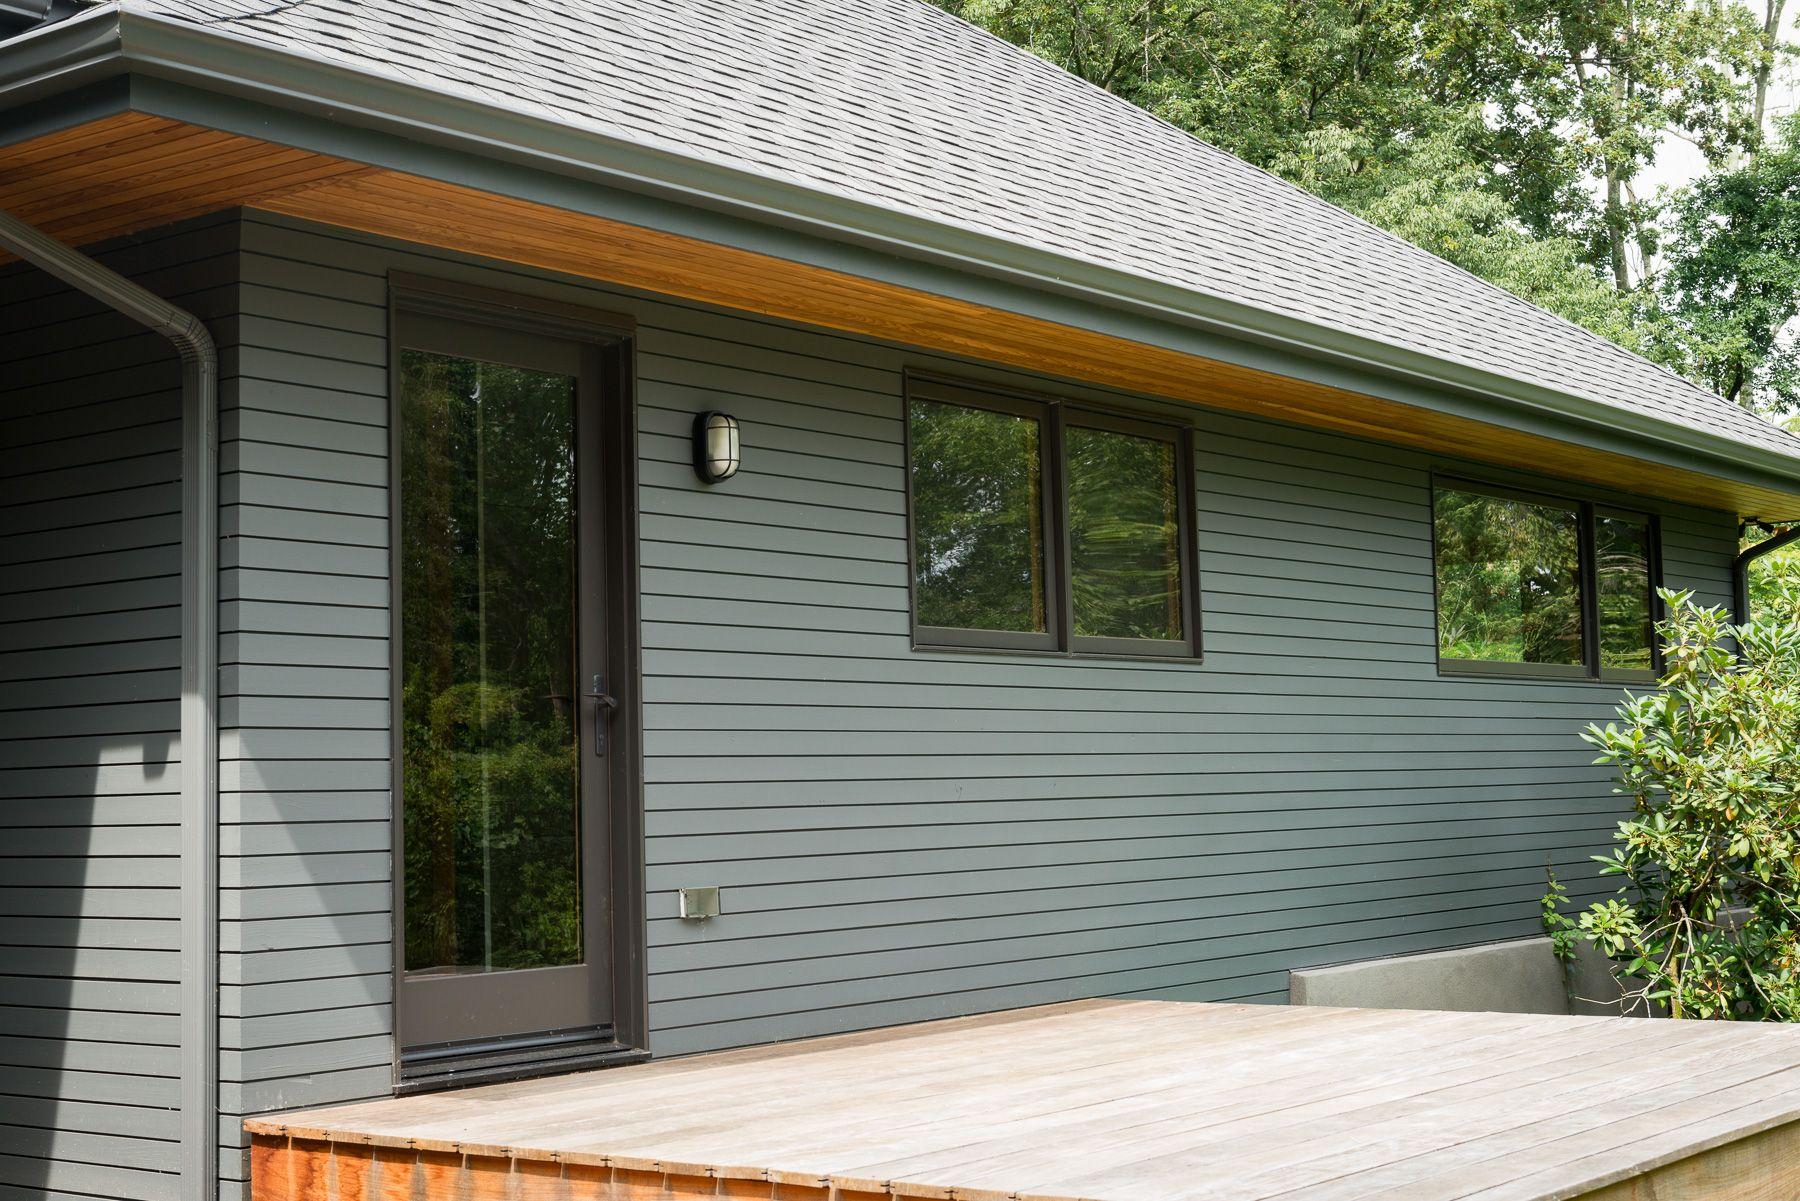 1x4 Shadow Gap Cedar Siding In 2020 Cedar Homes Cedar Siding Home Accents